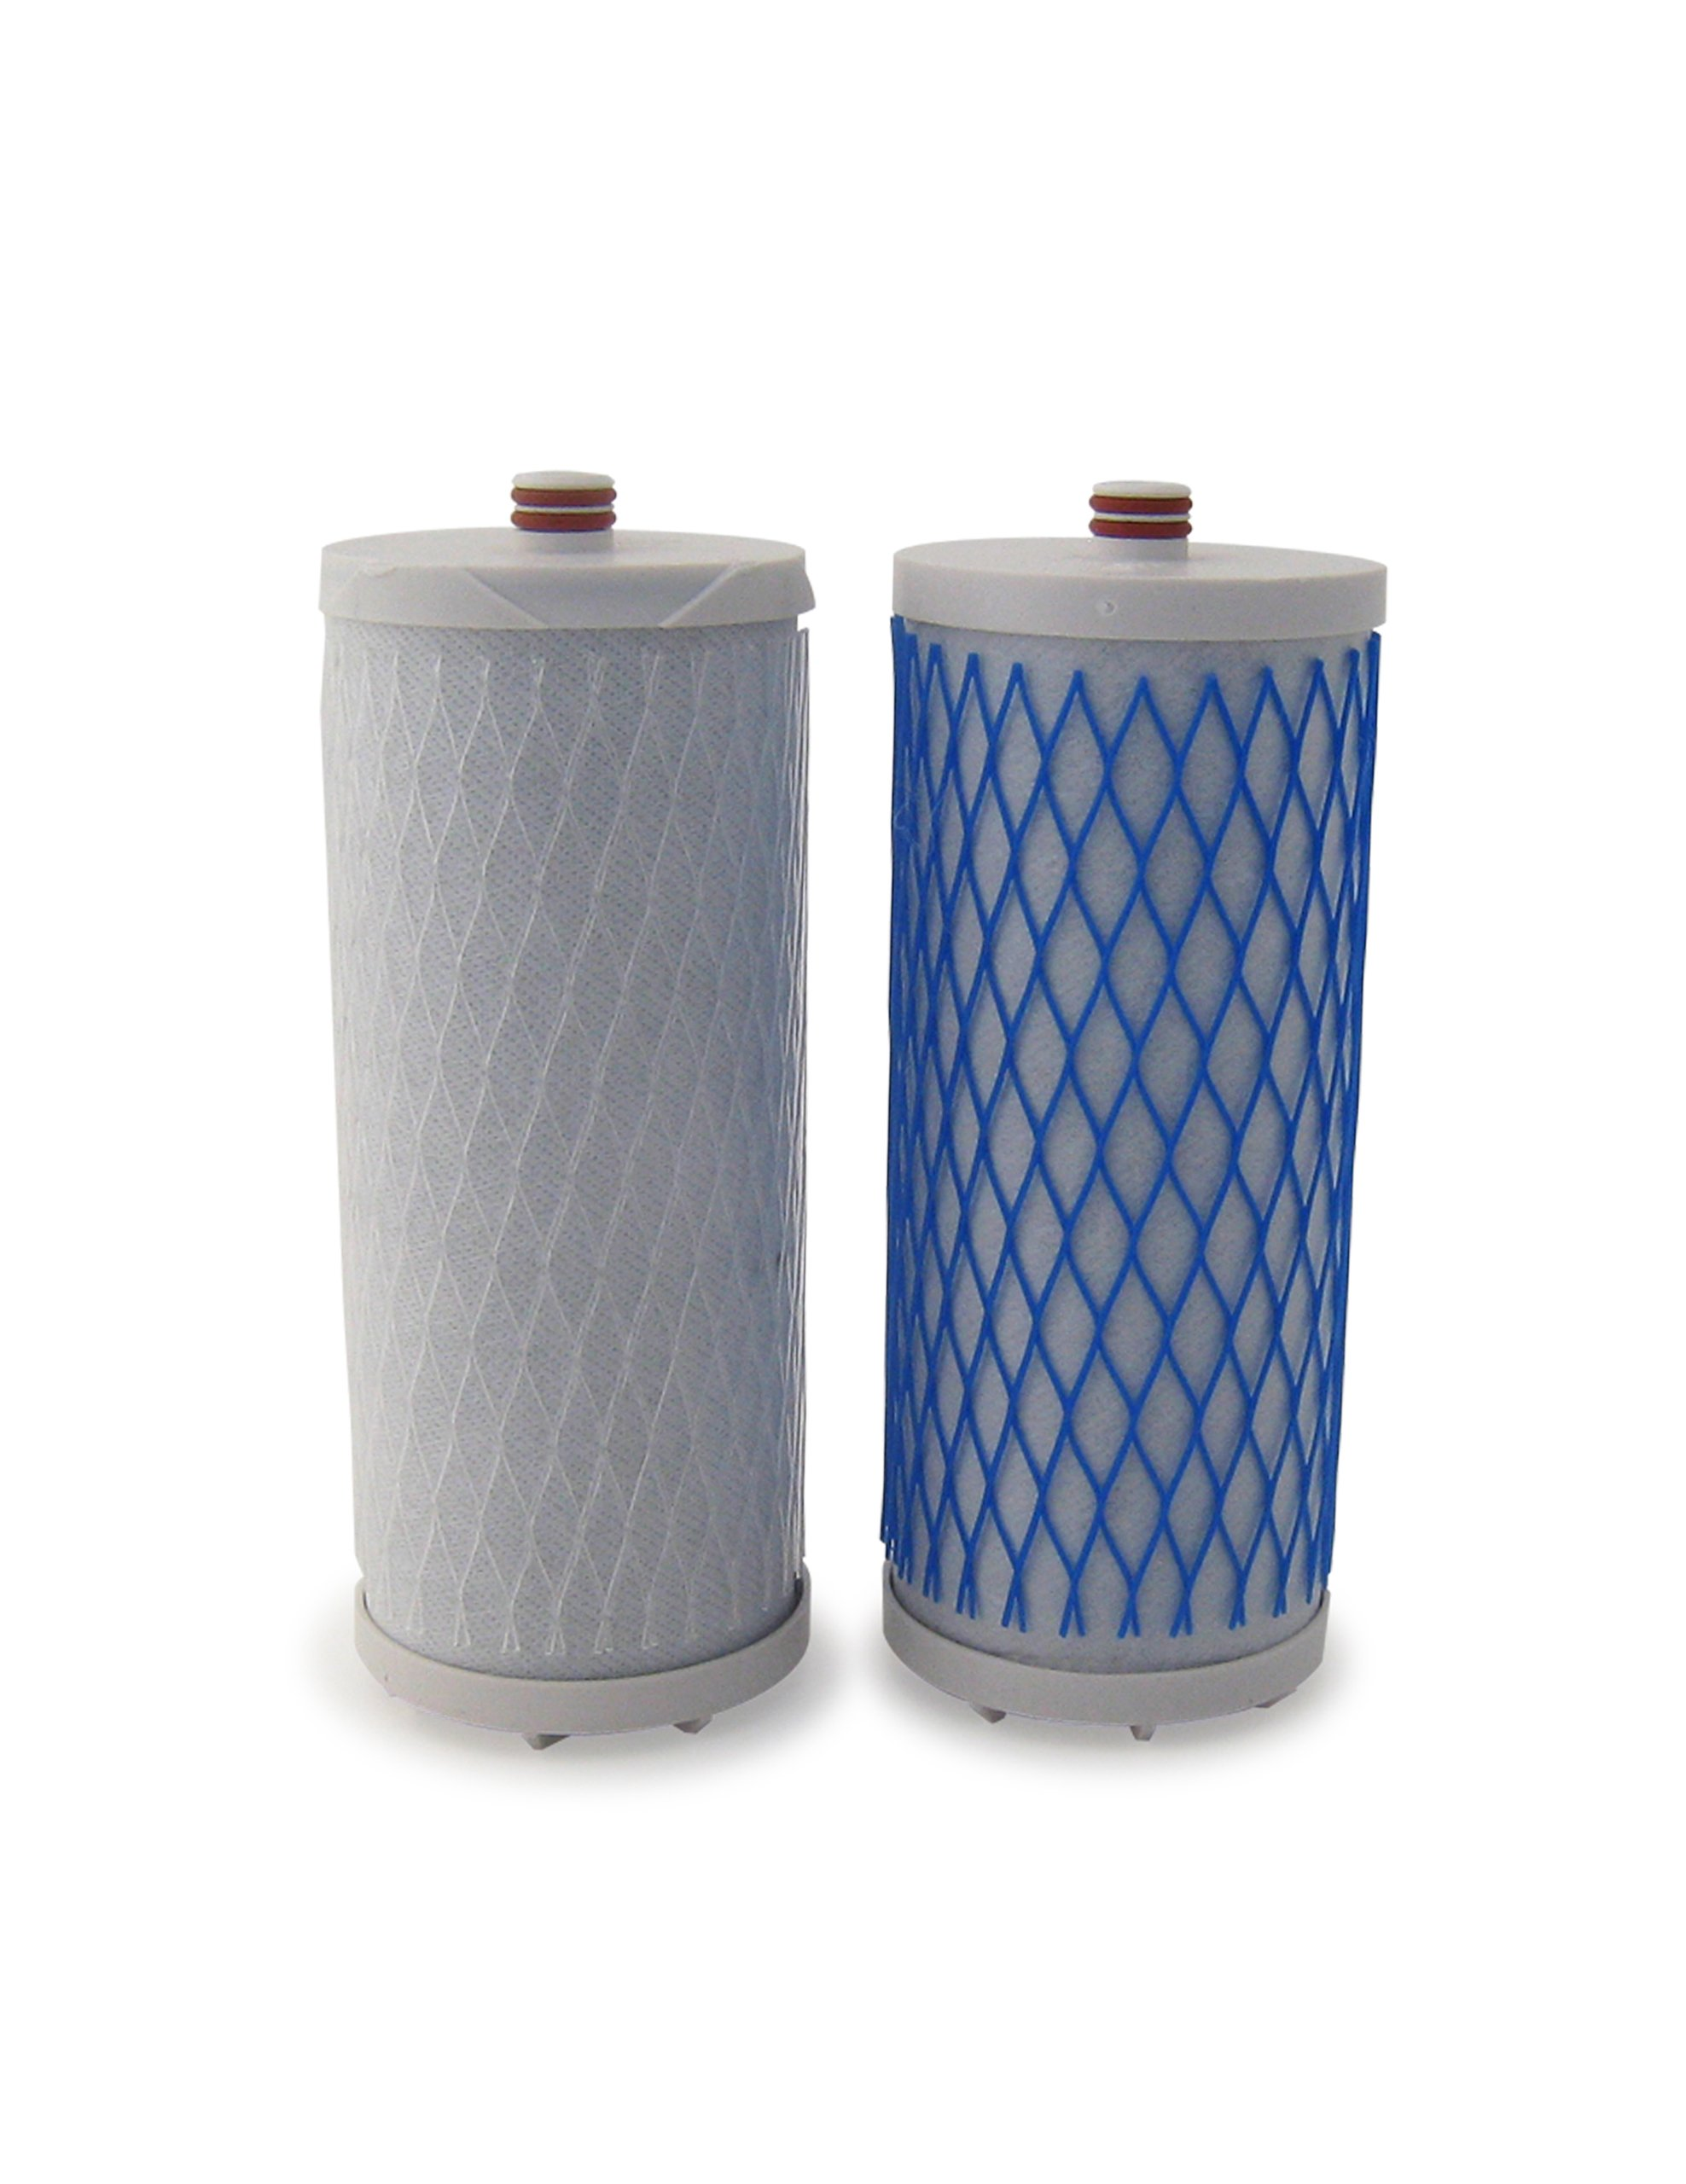 Aquasana Replacement Filter Cartridges for Aquasana Countertop Water Filtration System